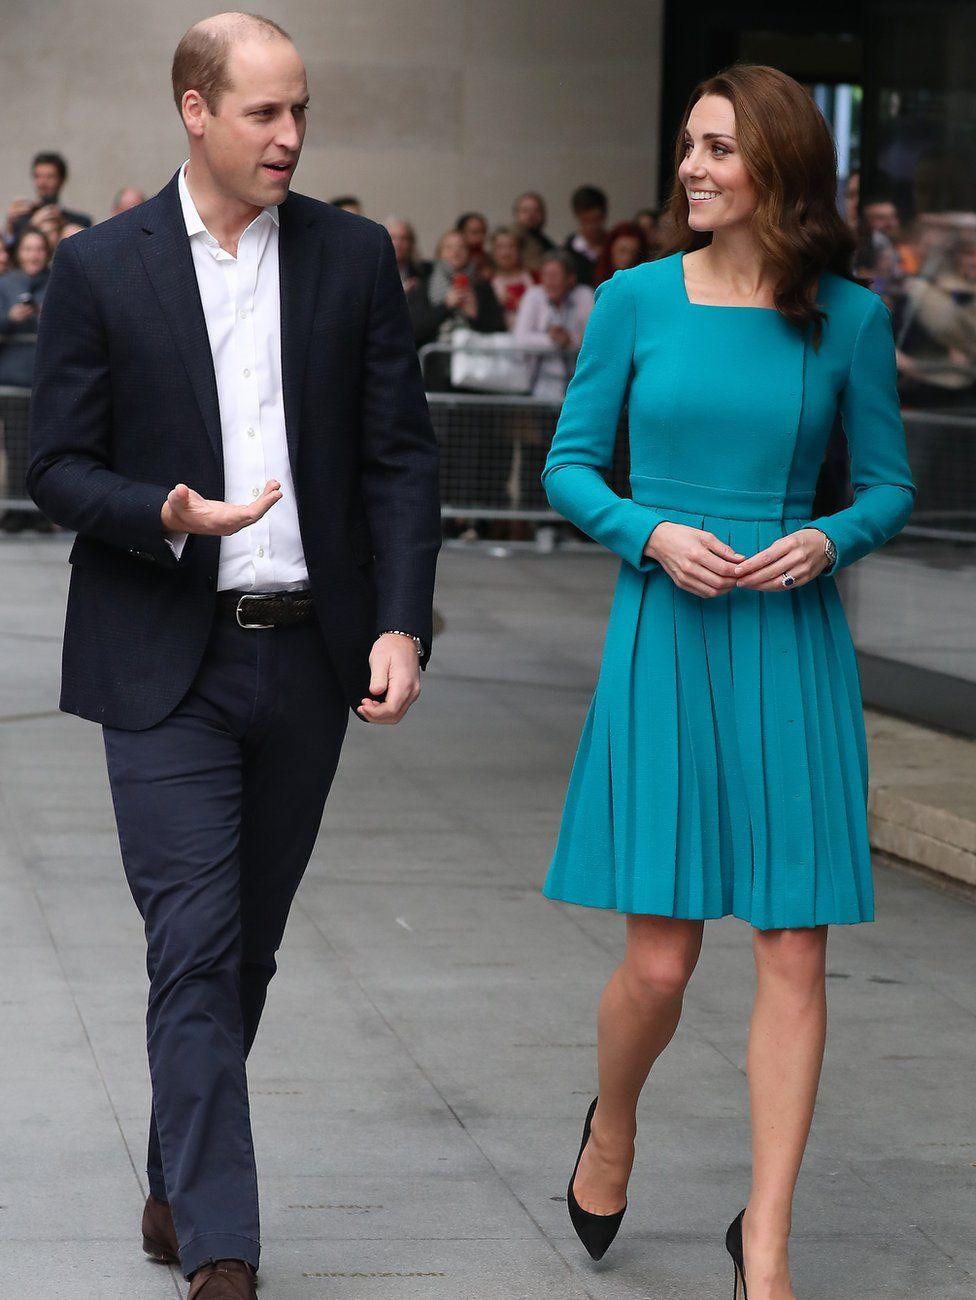 Prince William, Duke of Cambridge and Catherine, Duchess of Cambridge at BBC Broadcasting House